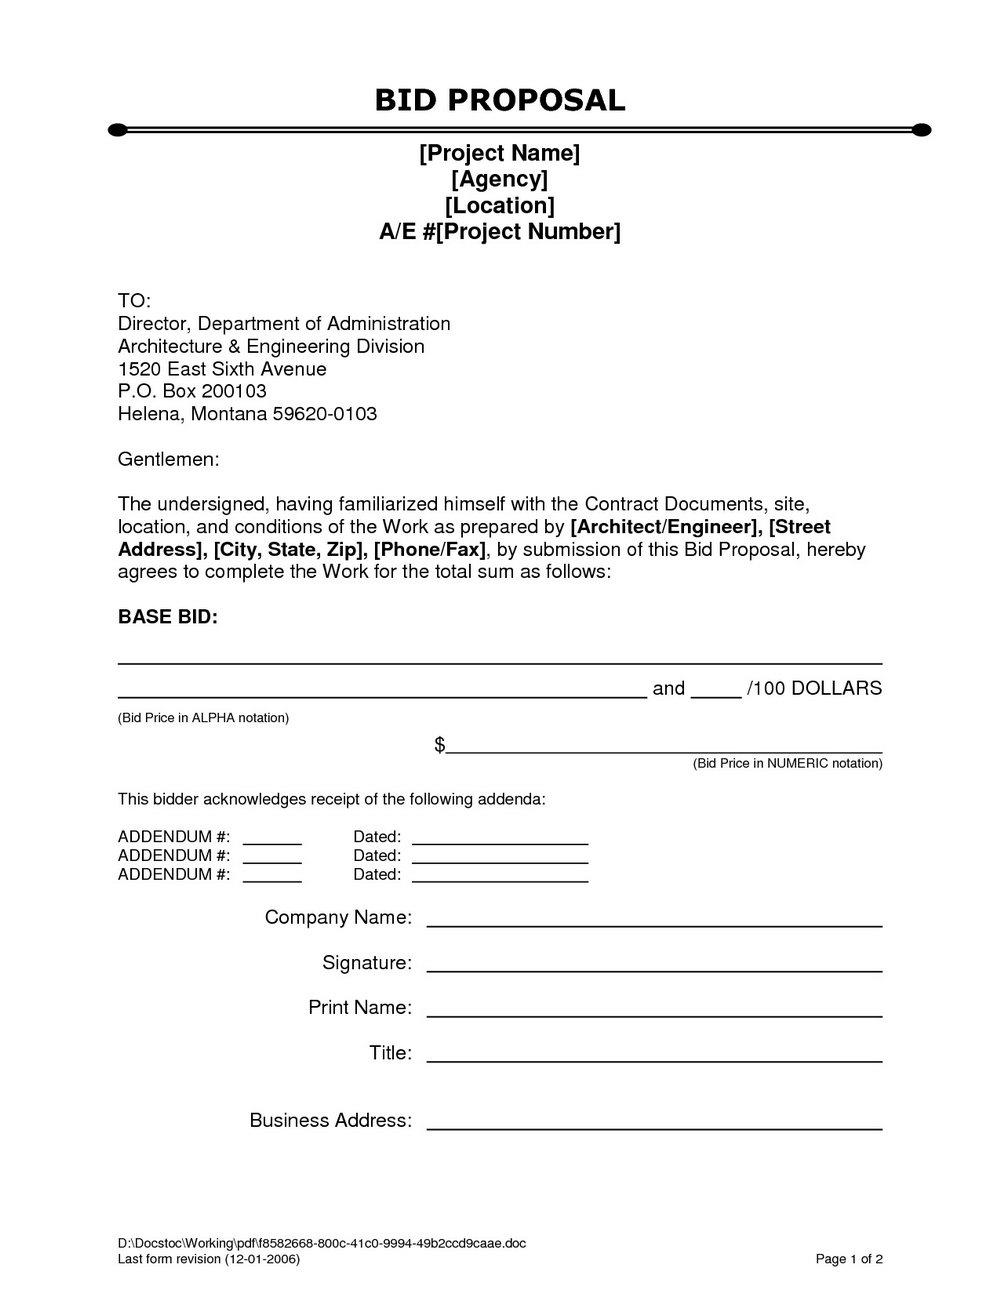 Bid Proposal Template Excel